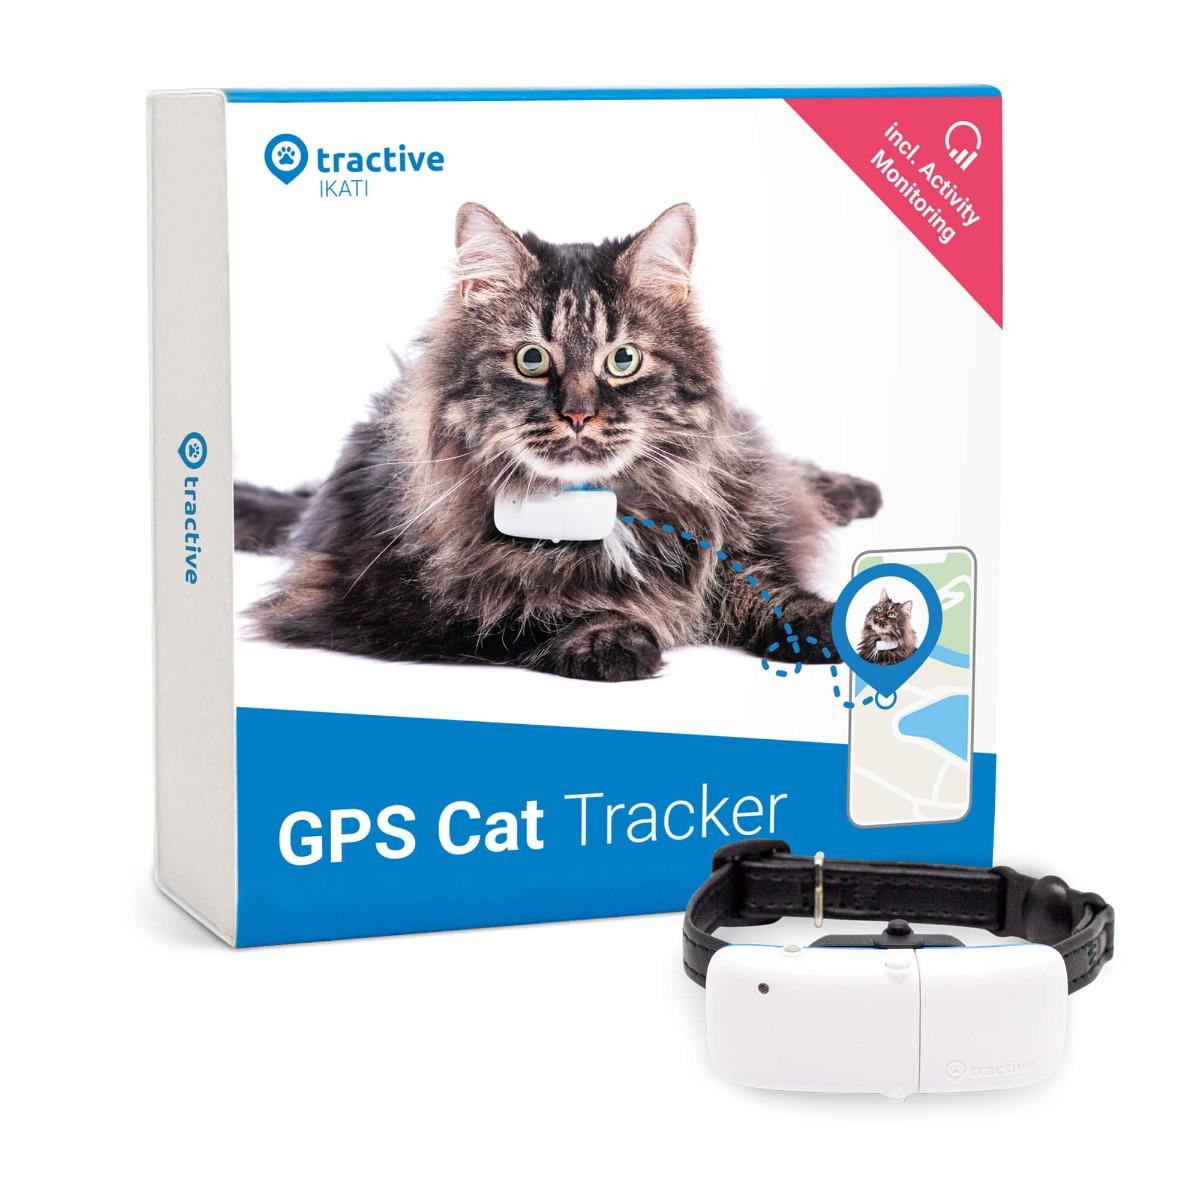 Tractive IKATI - GPS-трекер для кошек (уценка, вскрытая коробка)